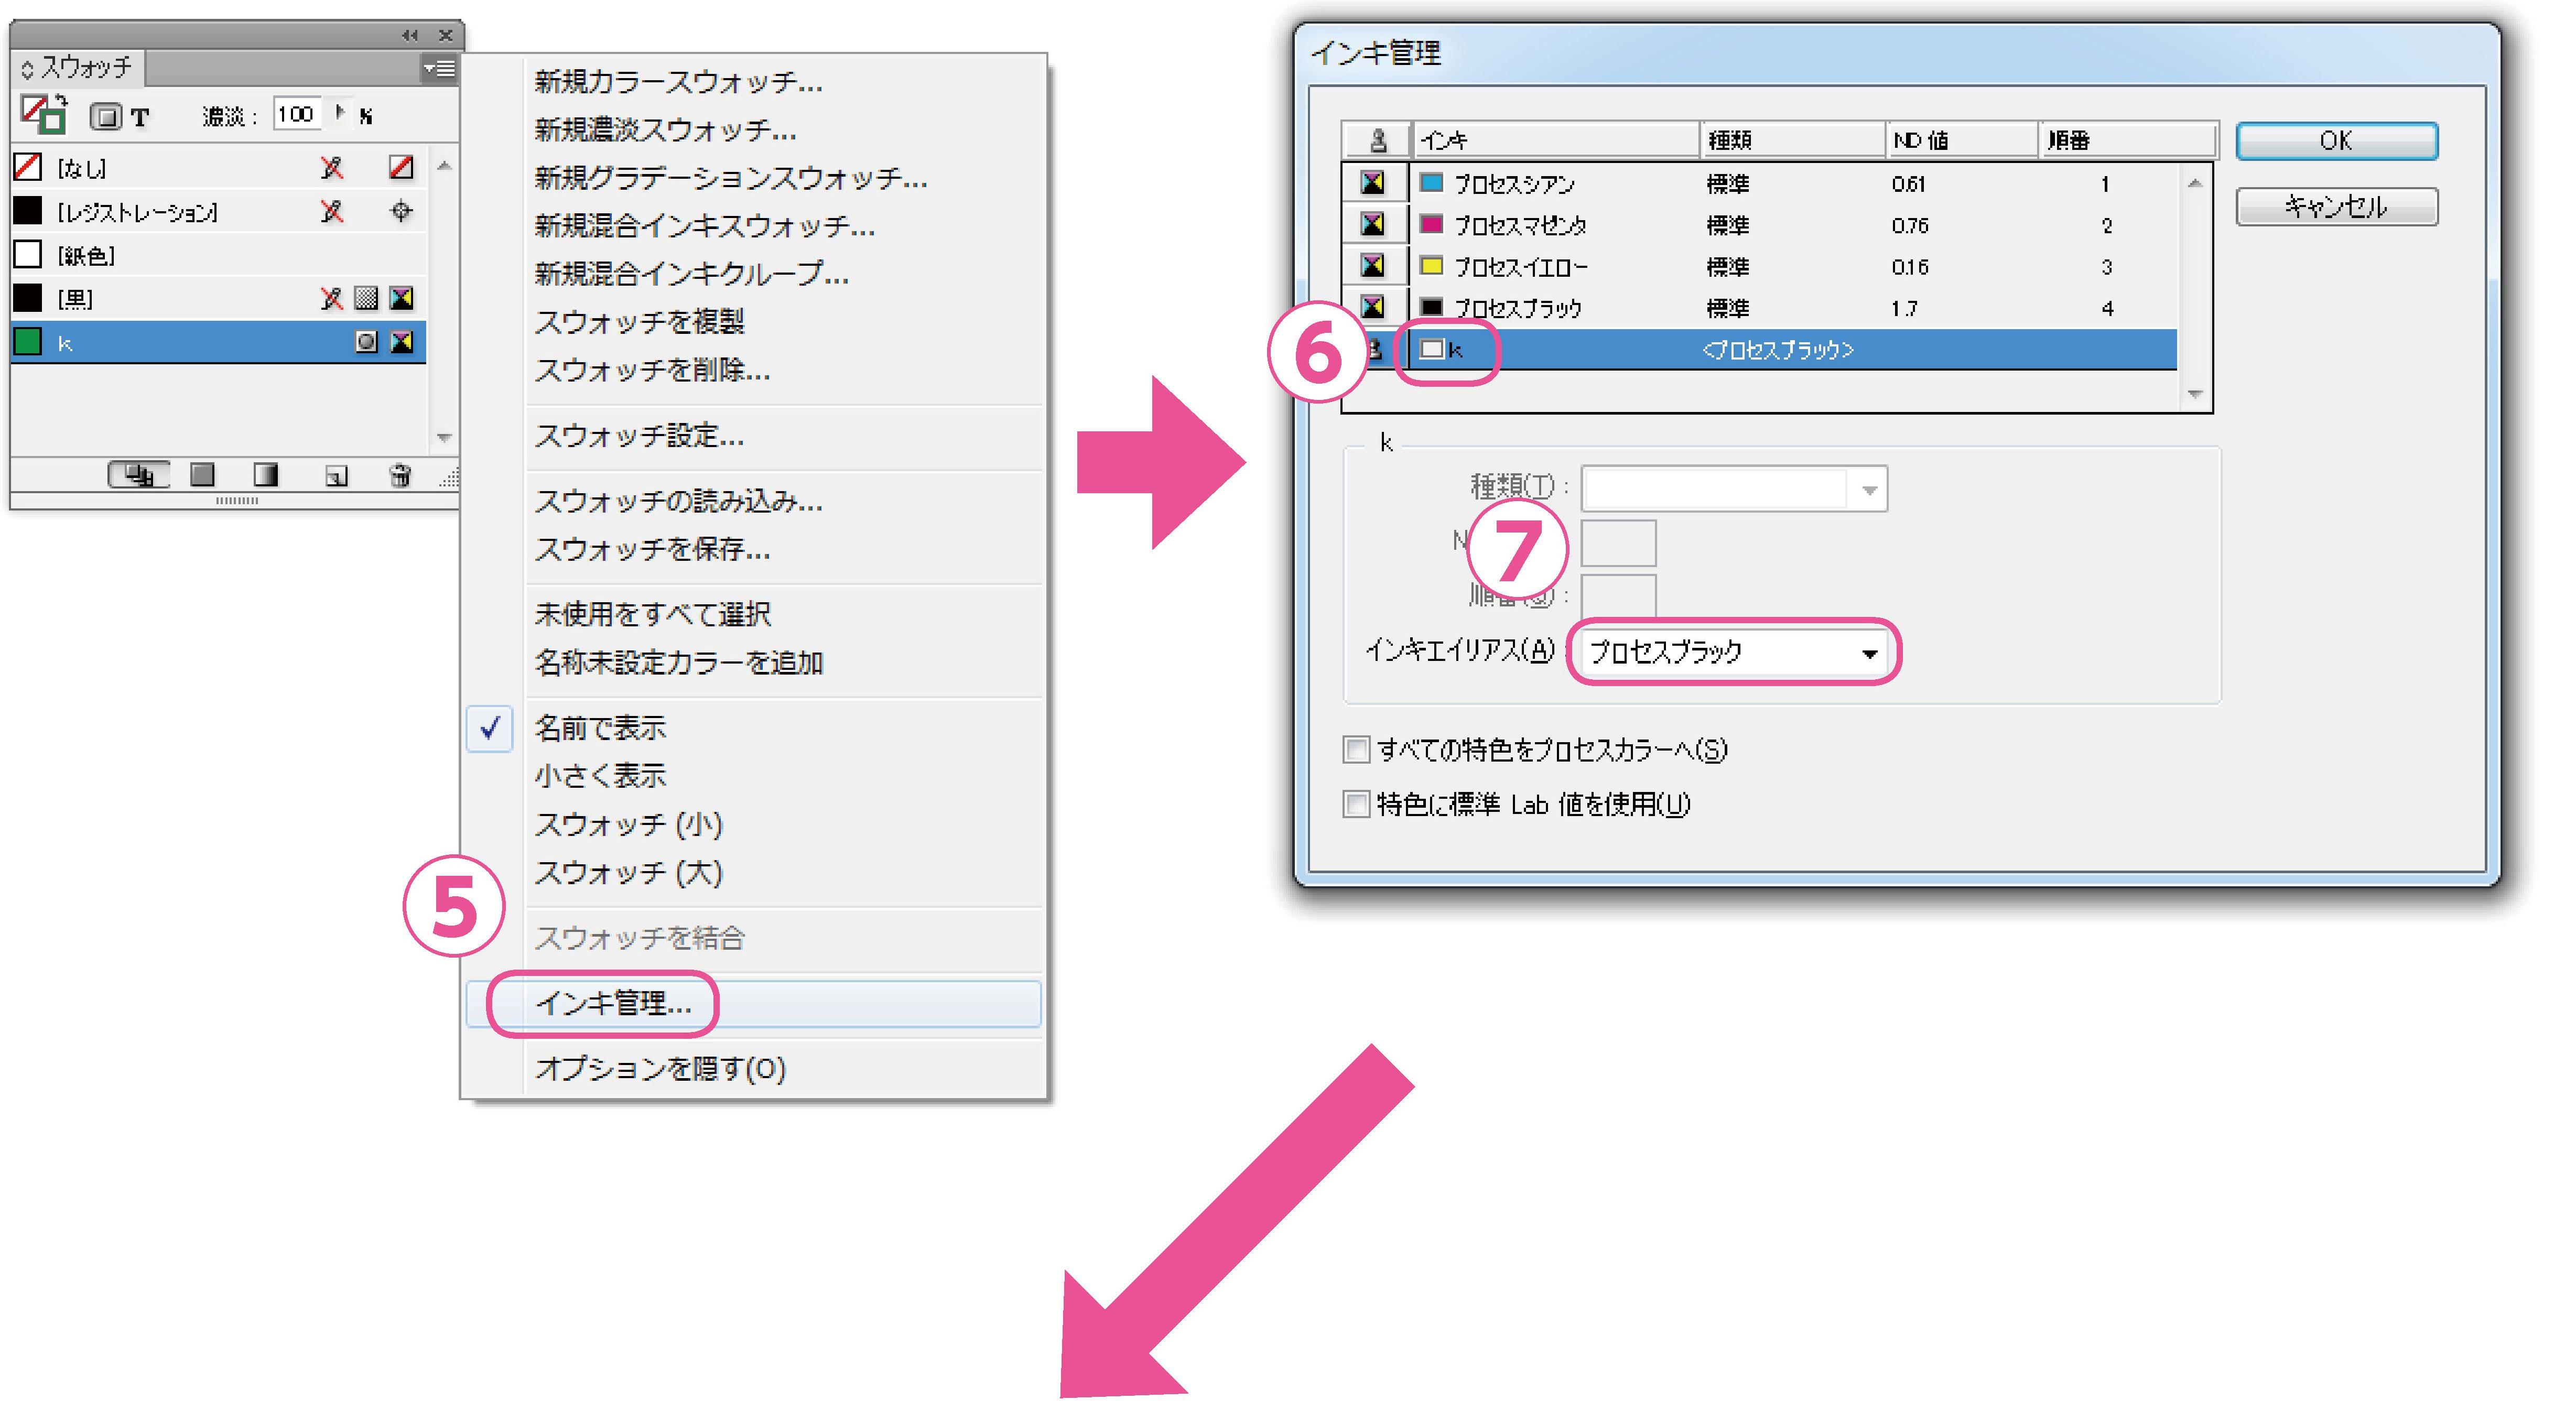 su_02-02.jpg